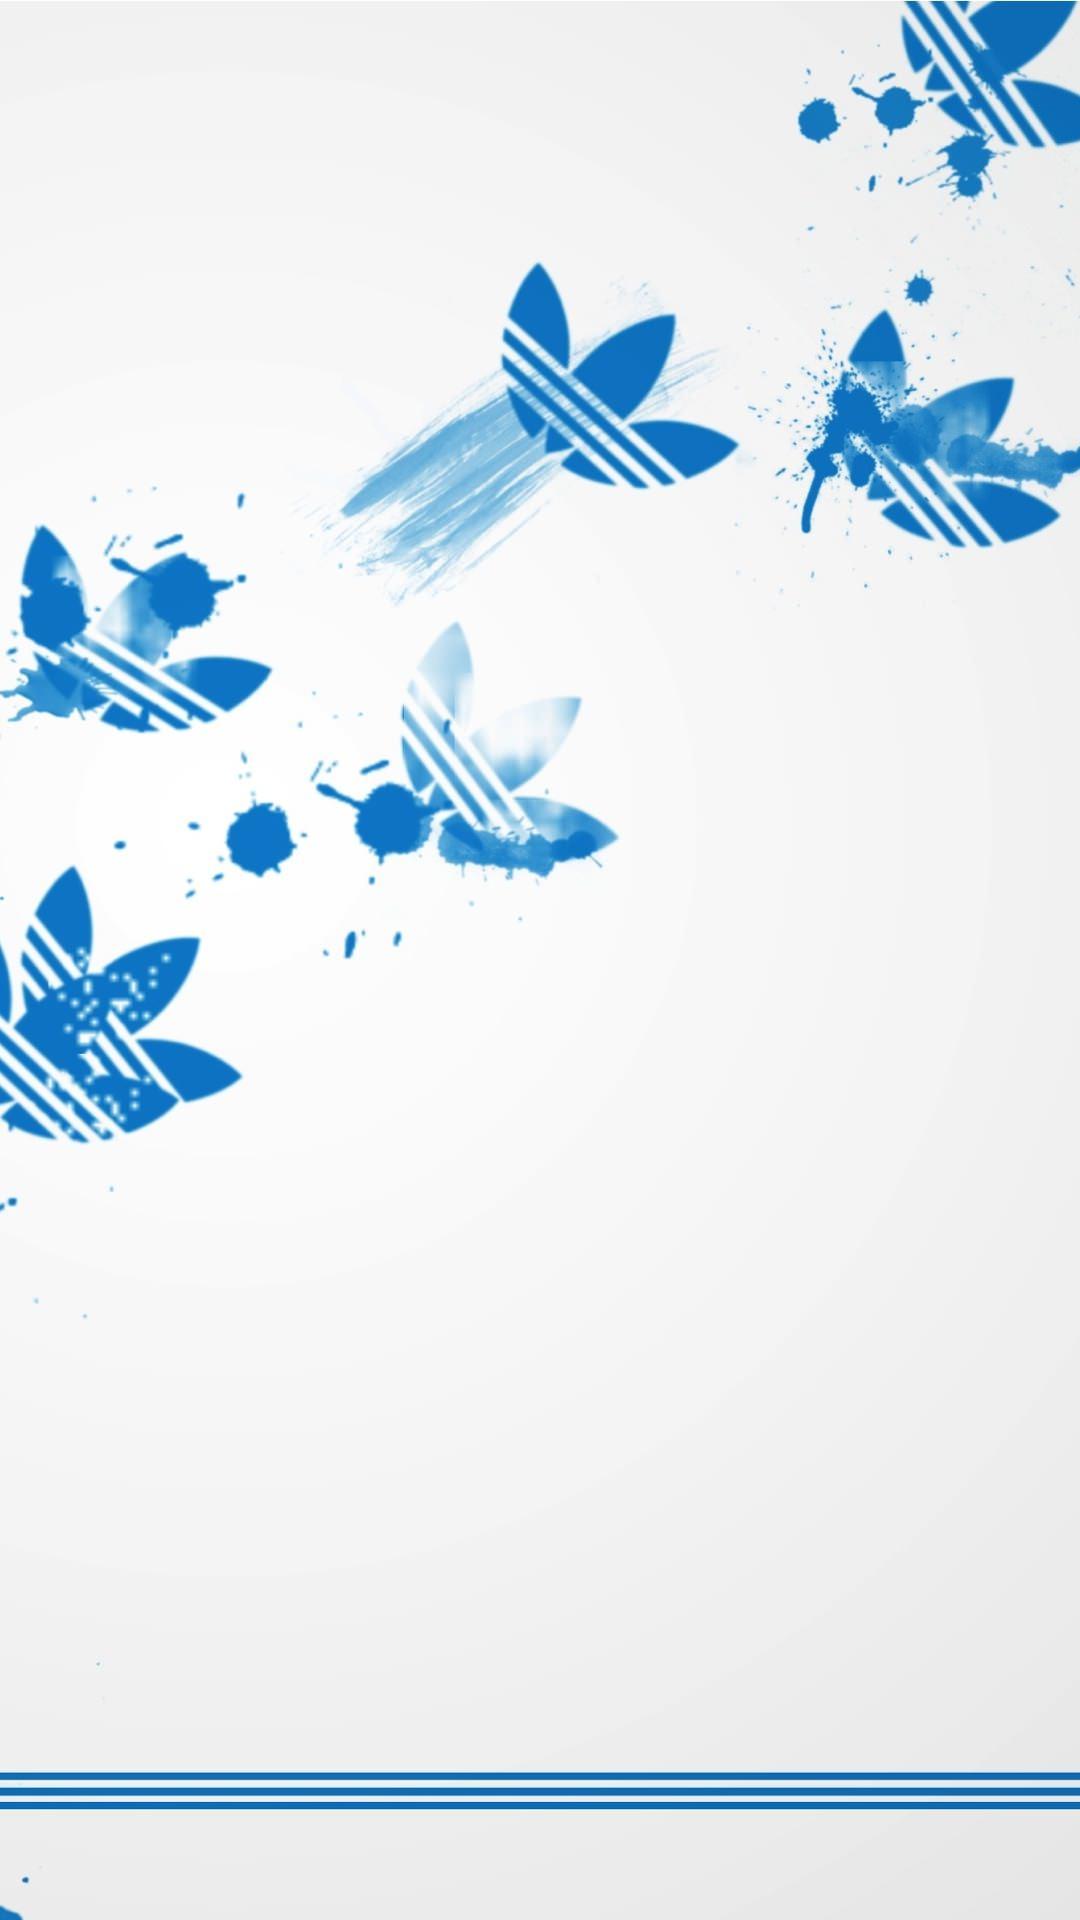 Adidas Iphone Background Download Free  PixelsTalkNet